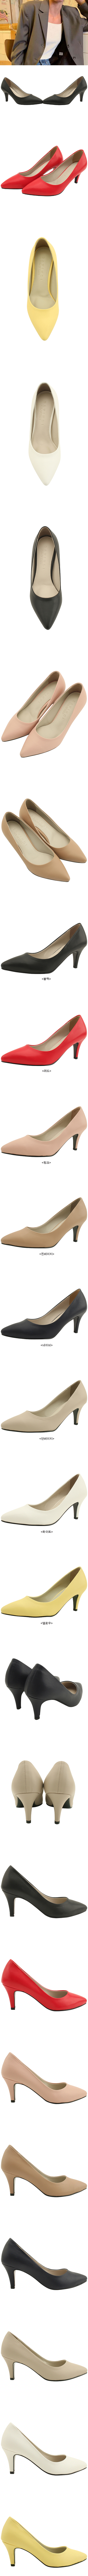 Stiletto high heel basic shoes 7cm pink